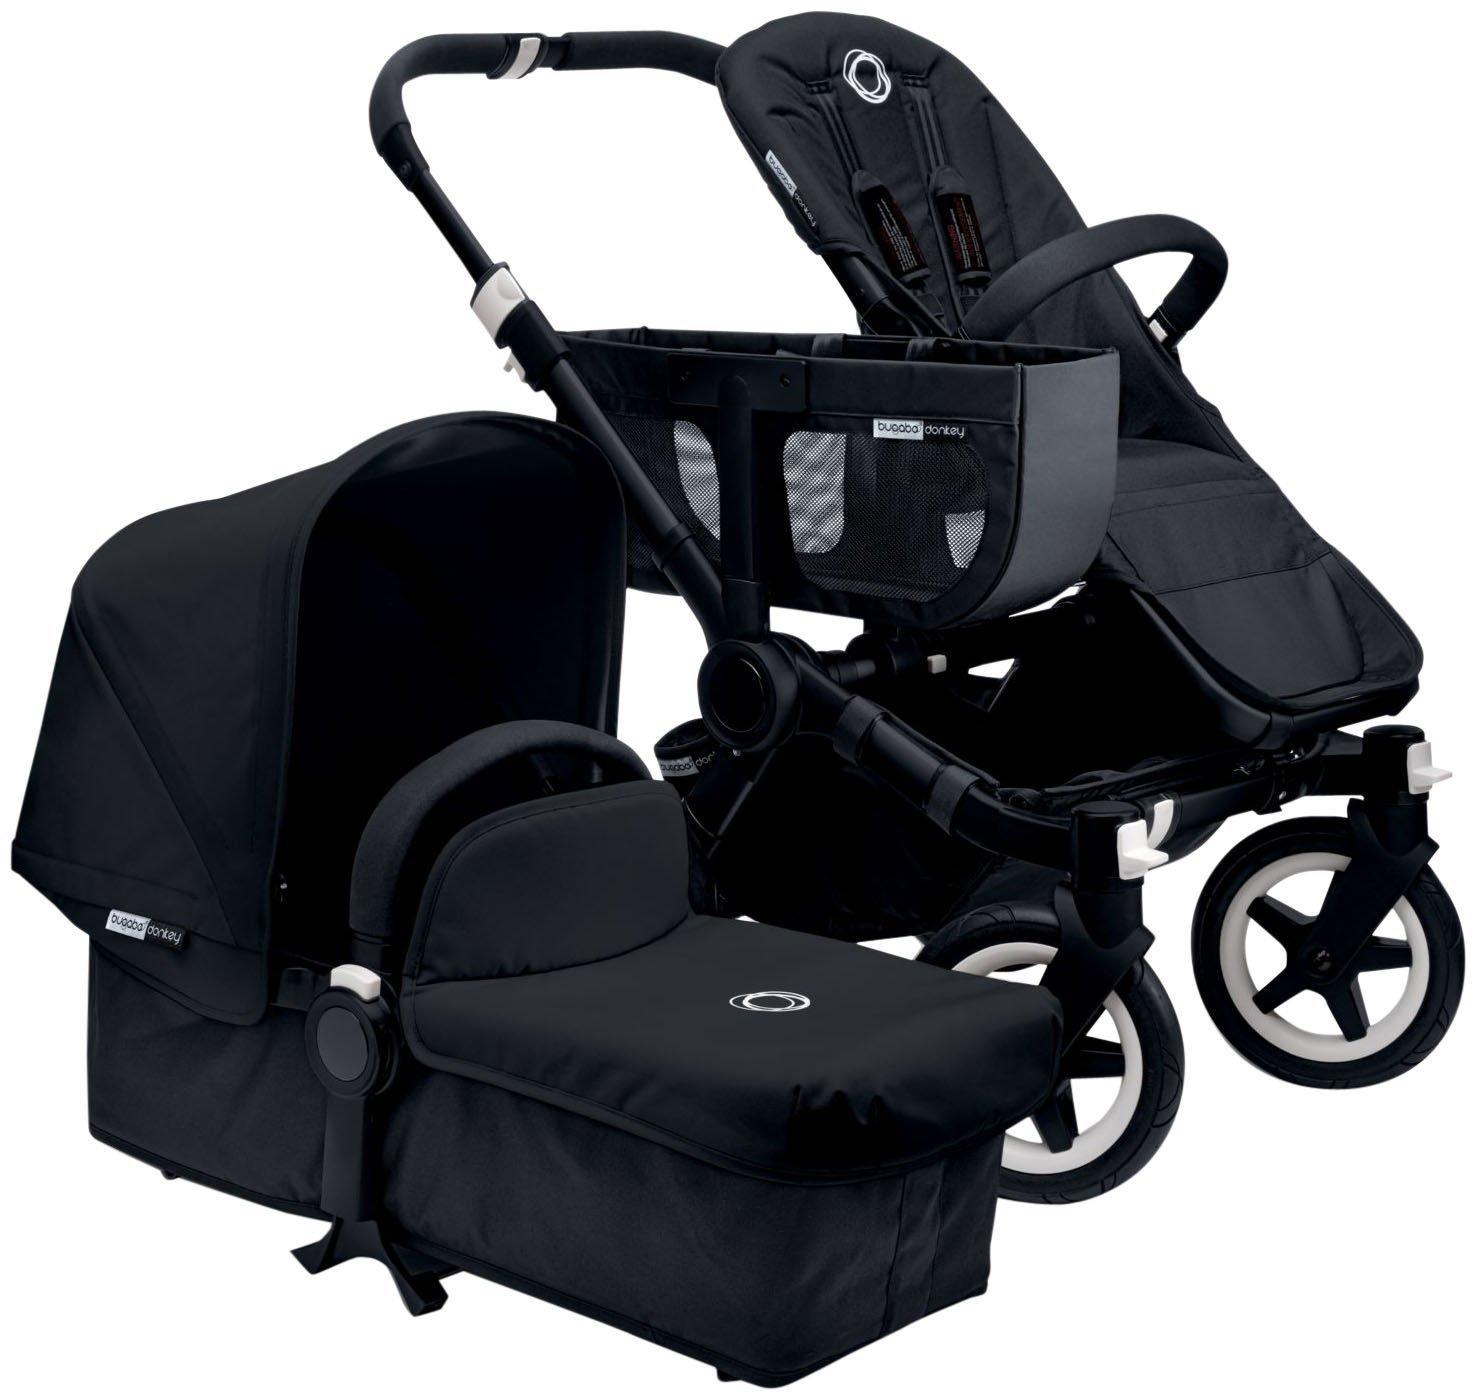 Amazon.com : Bugaboo Donkey Stroller Base - Black/Black : Baby